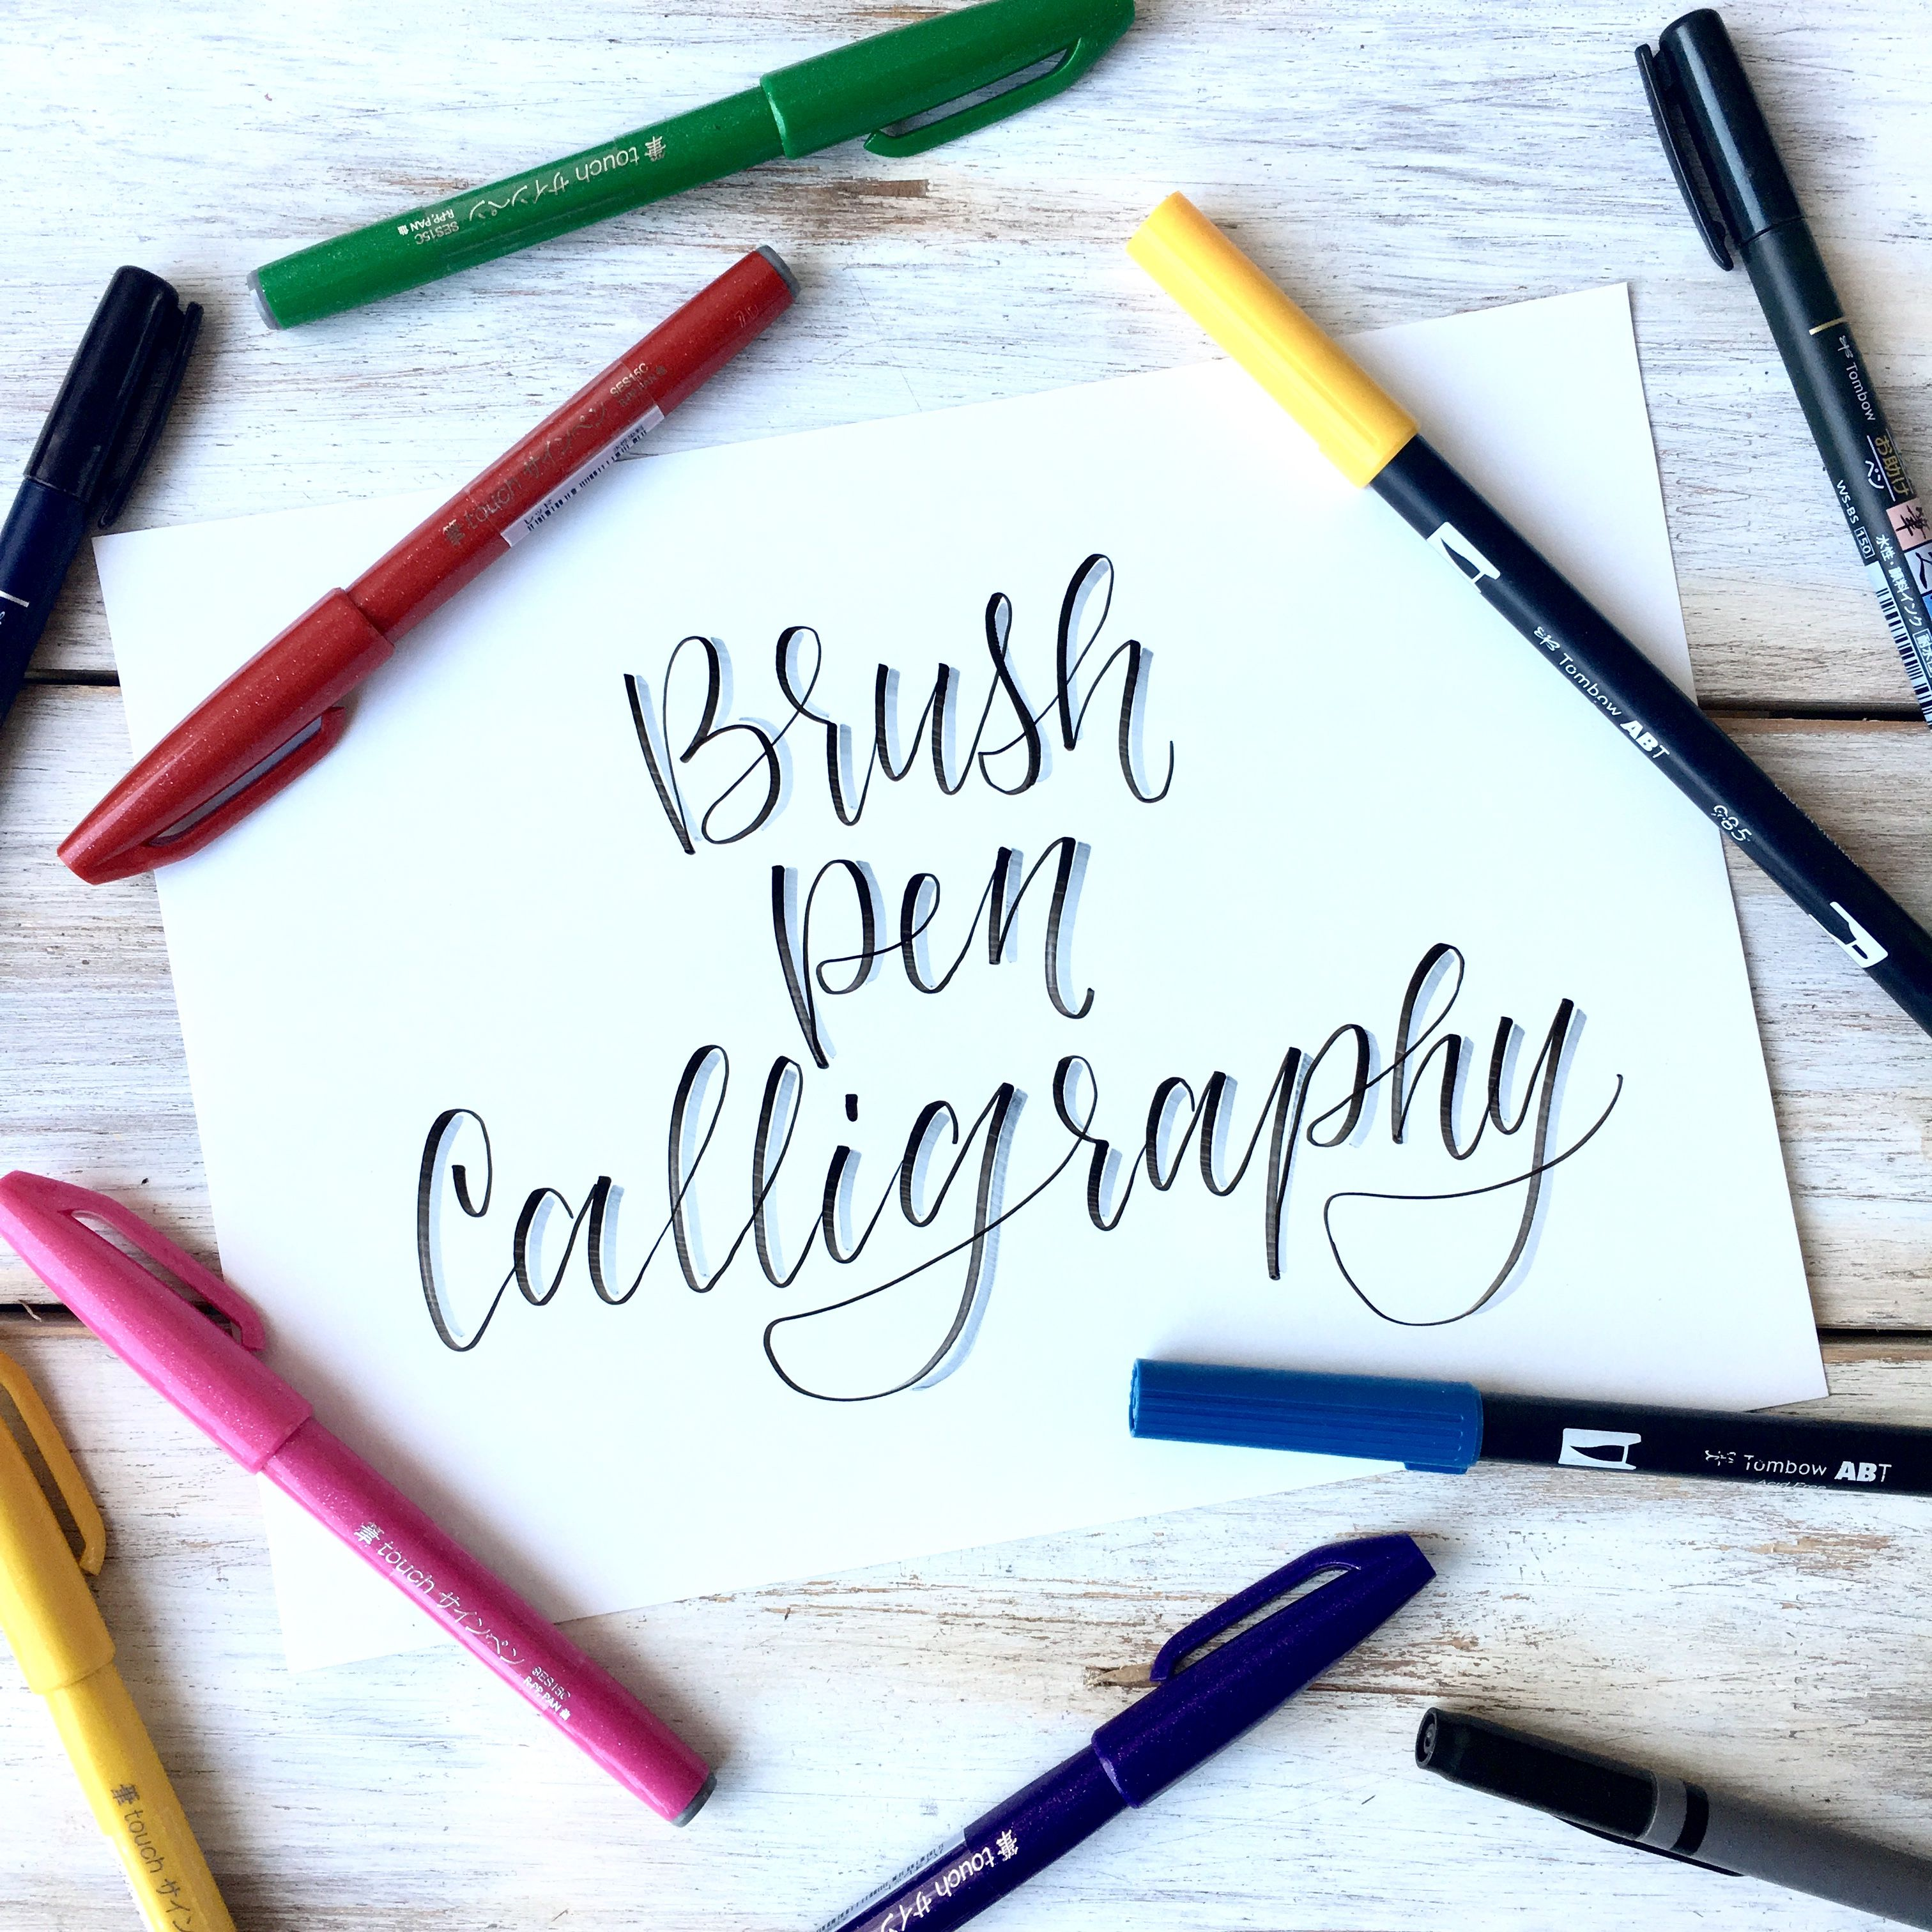 Brush Pen Calligraphy Basics Plus Free Printable Practice Sheets Scribbling Grace Calligraphy For Beginners Brush Pen Calligraphy Brush Pen Lettering [ 3024 x 3024 Pixel ]